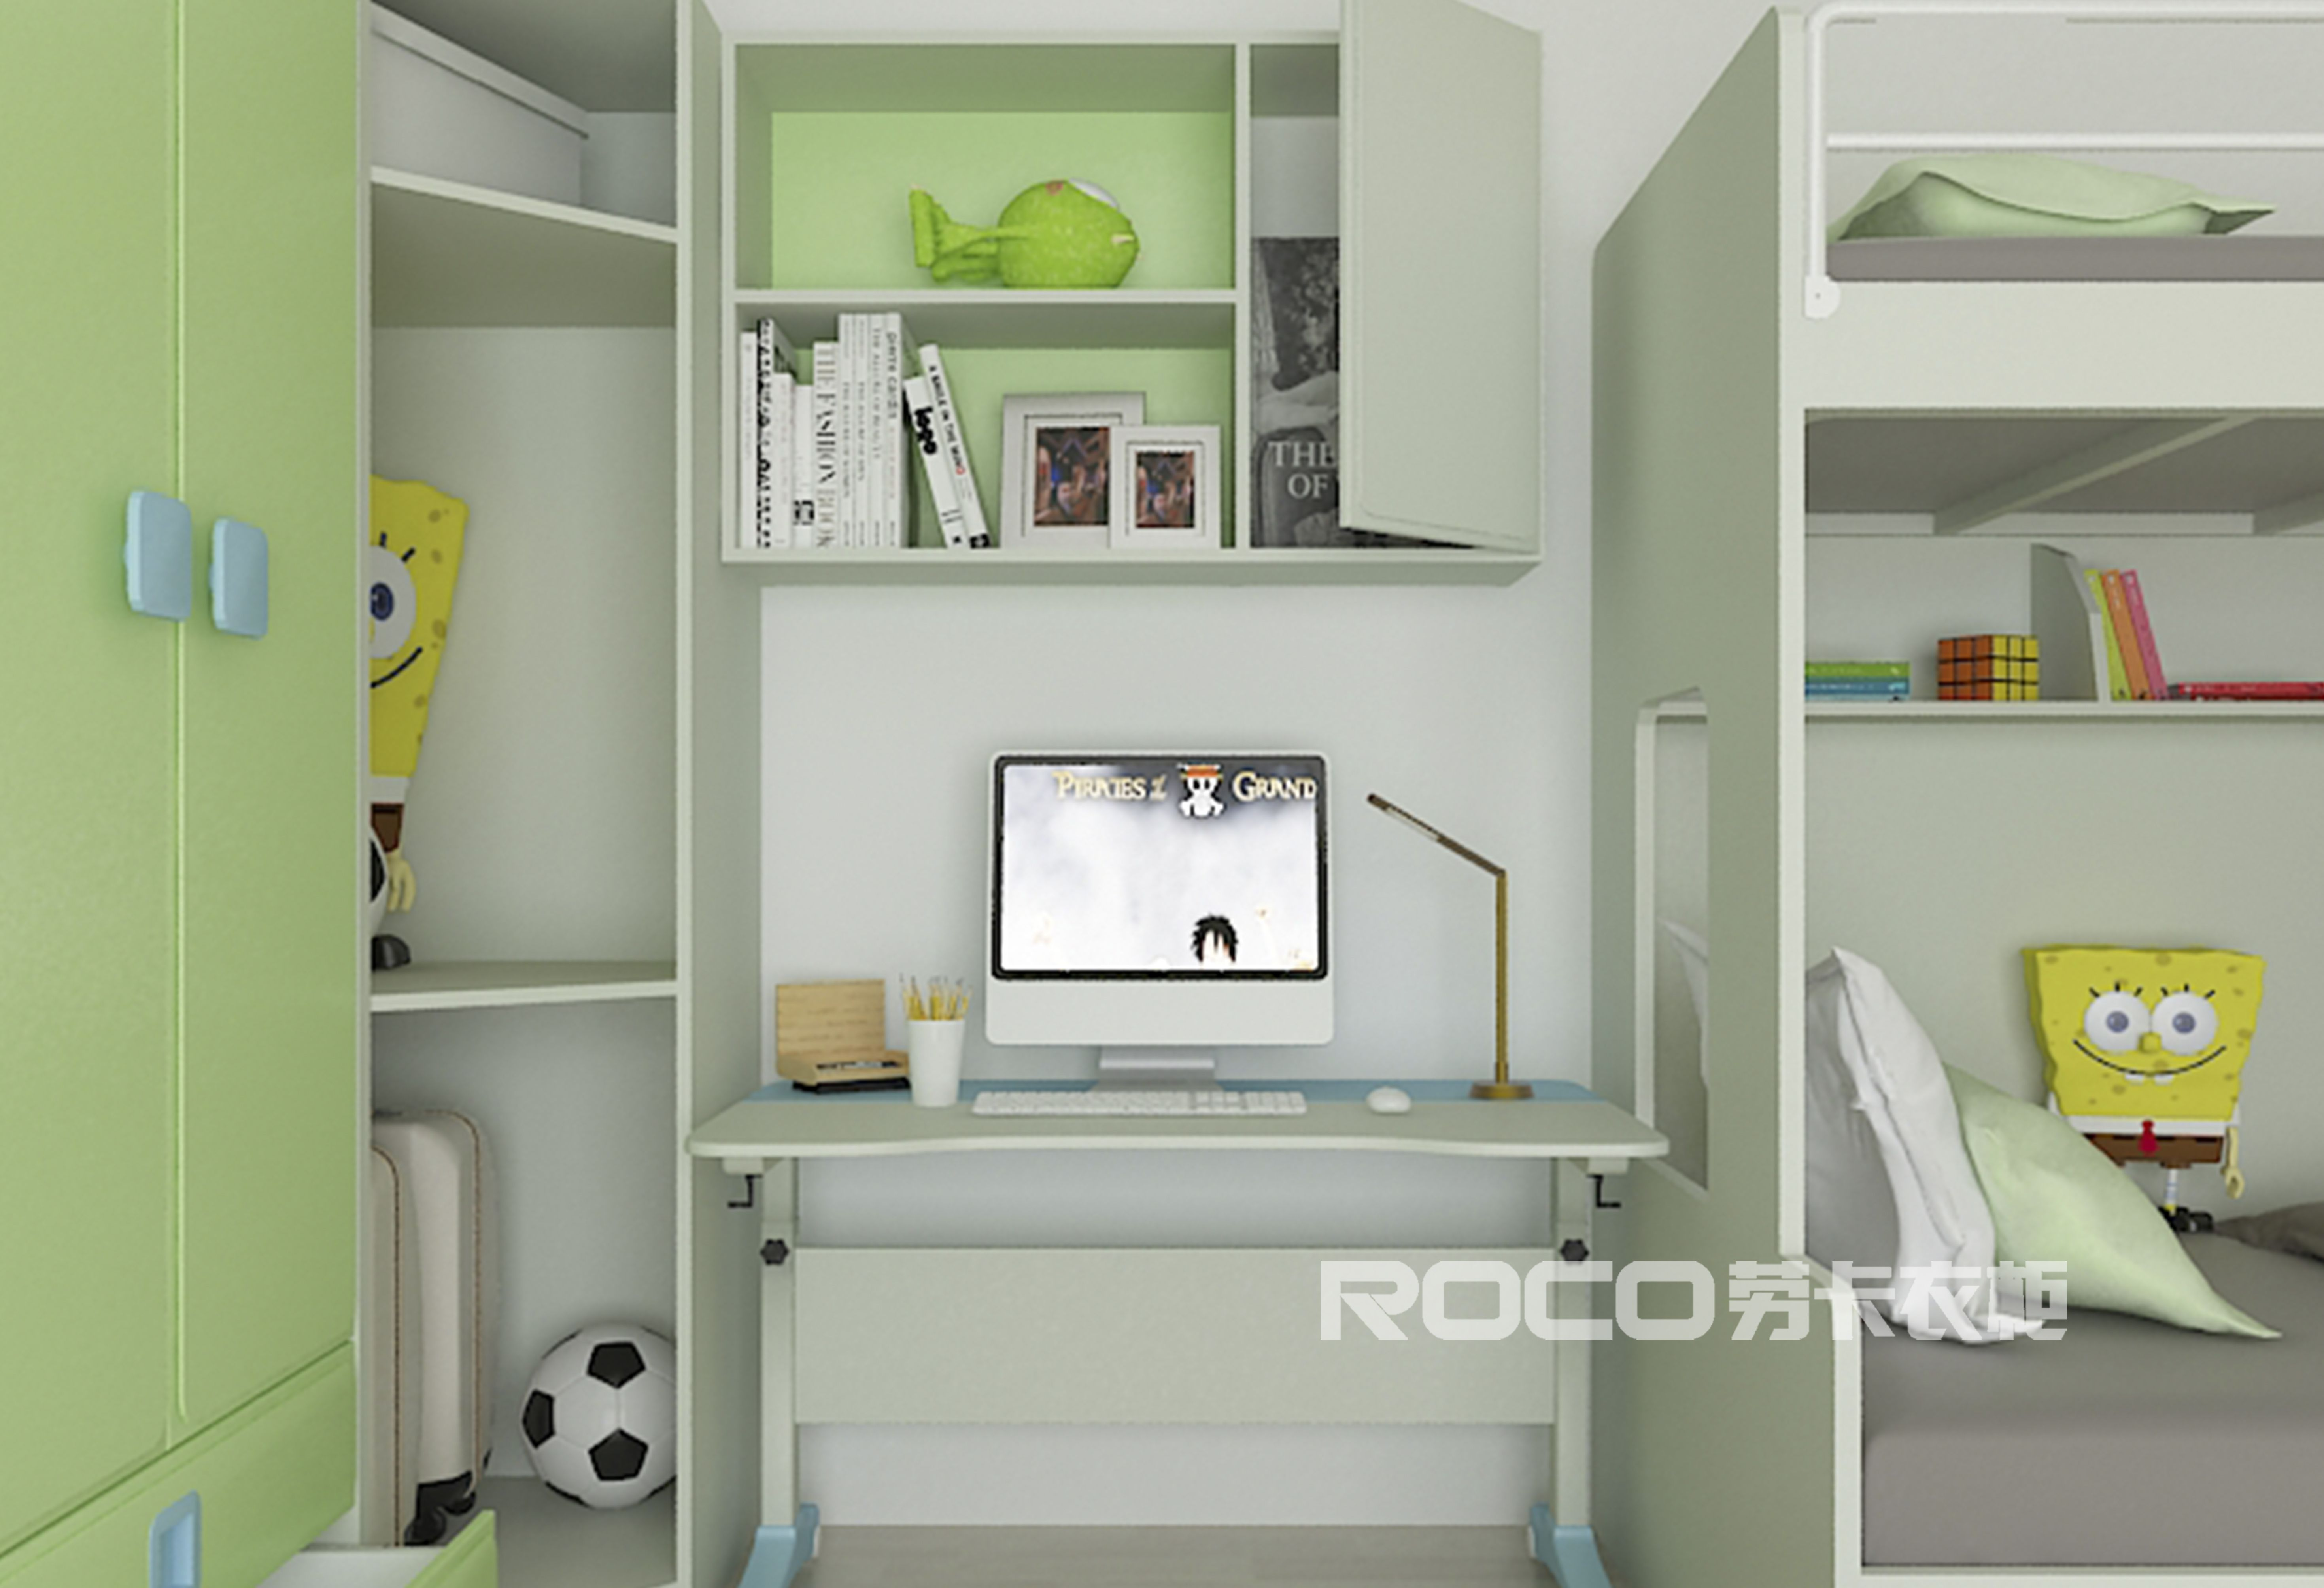 cubby furniture corner s white img projects diy children cubbybookshelfcorner plans ana desk bookshelf combo